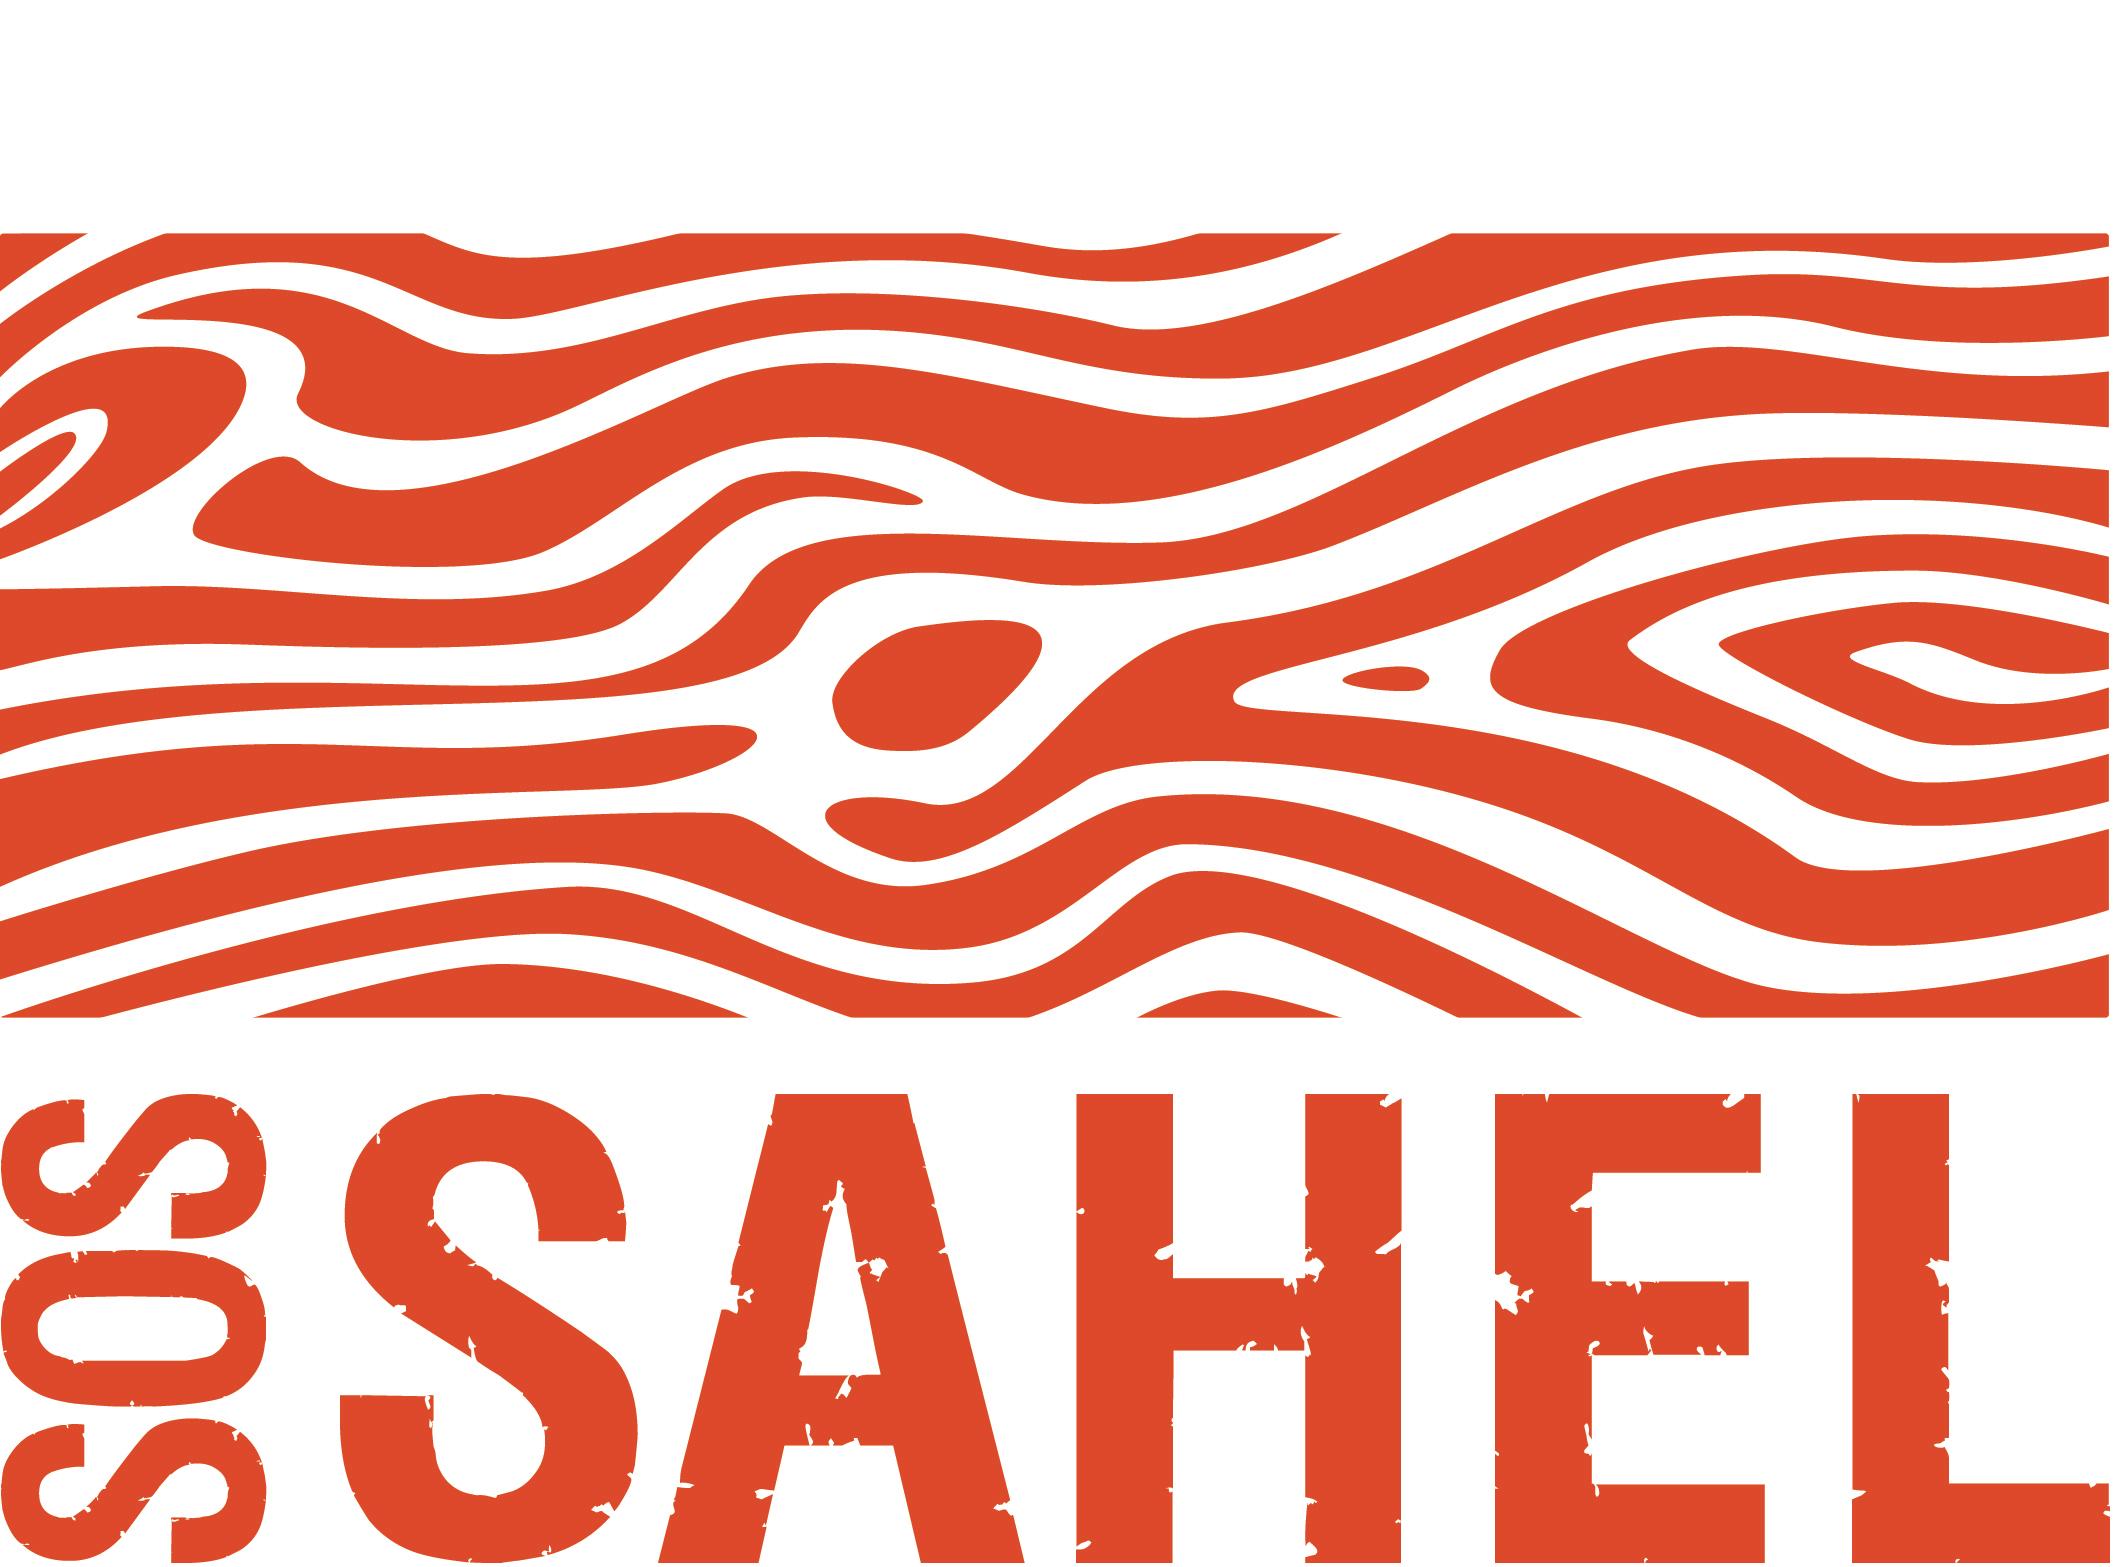 Sos-sahel.png